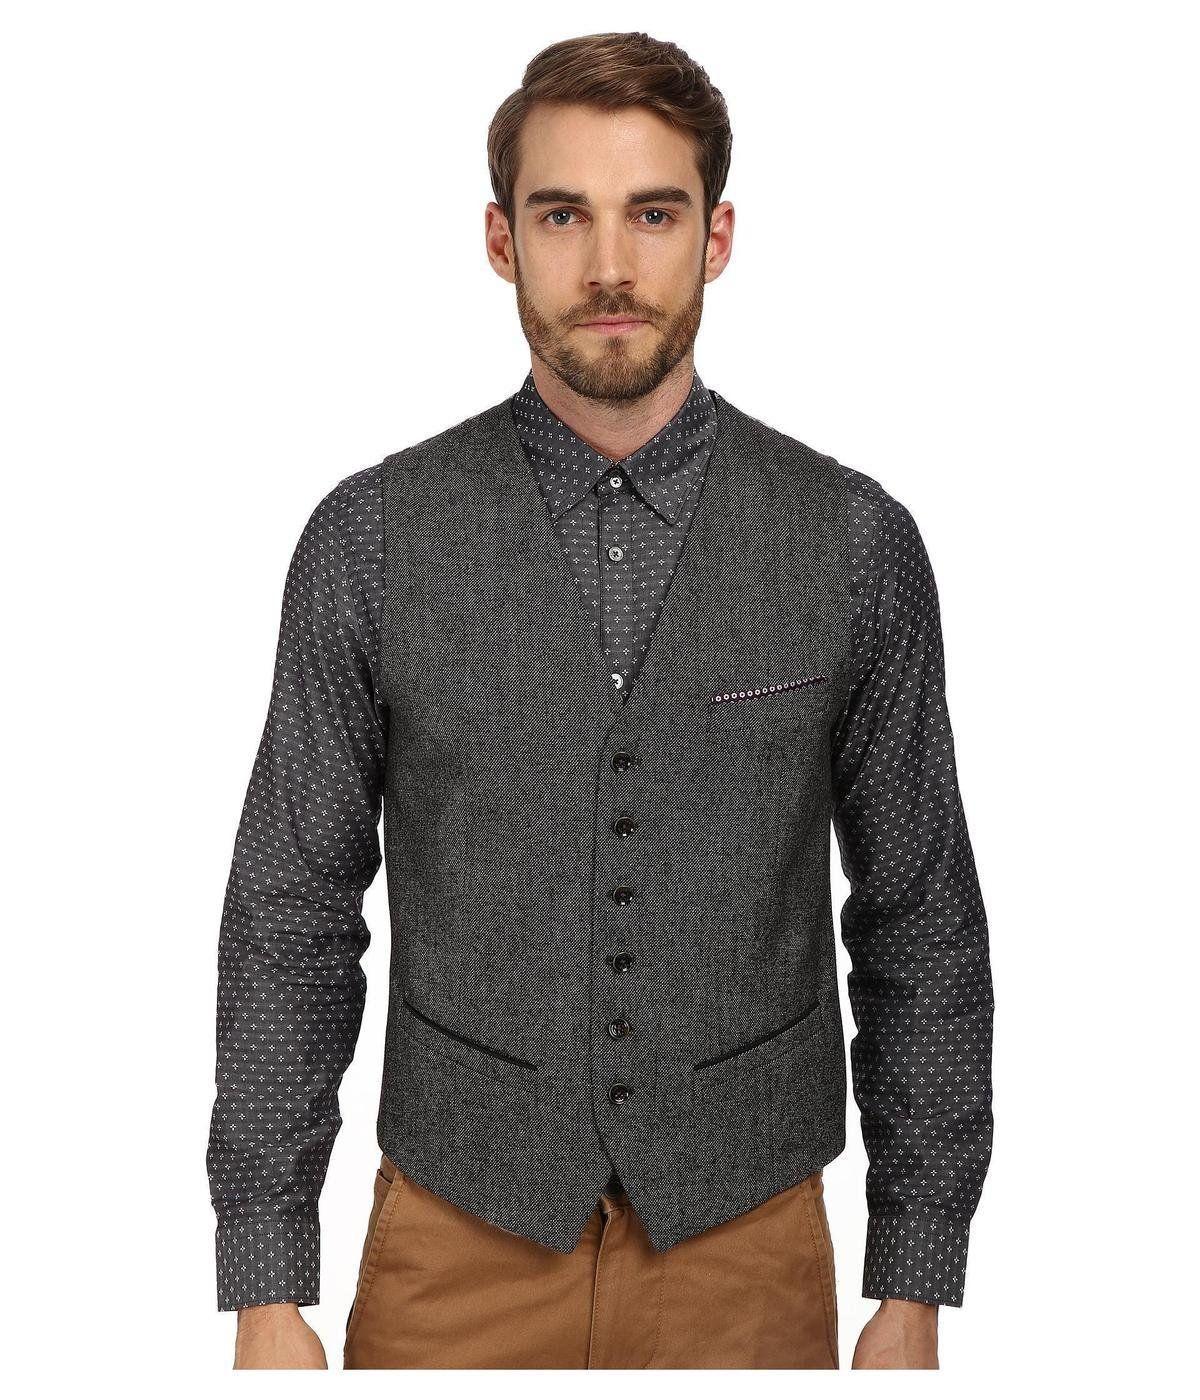 Jonwai Mini Design Waistcoat http://picvpic.com/men-coats-jackets ...